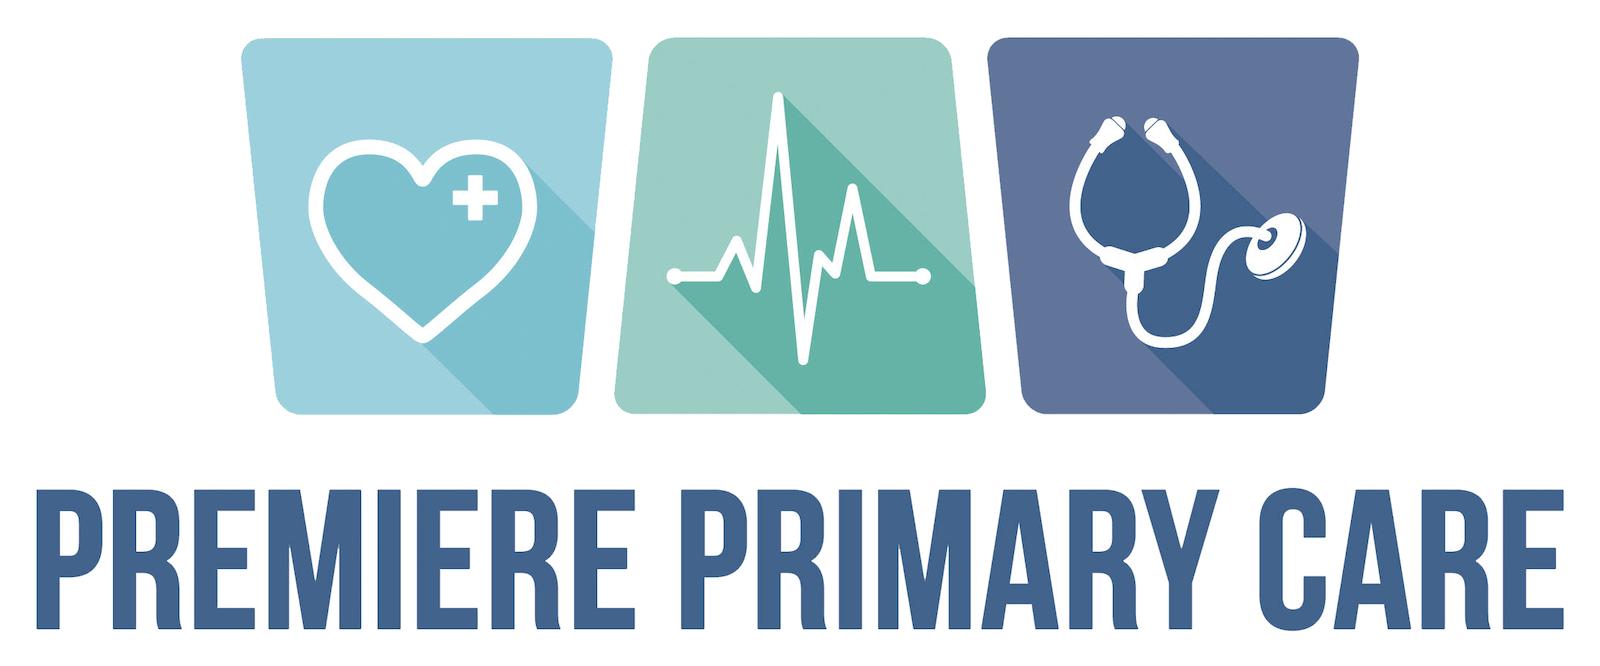 Premiere Primary Care - Video Visit Logo